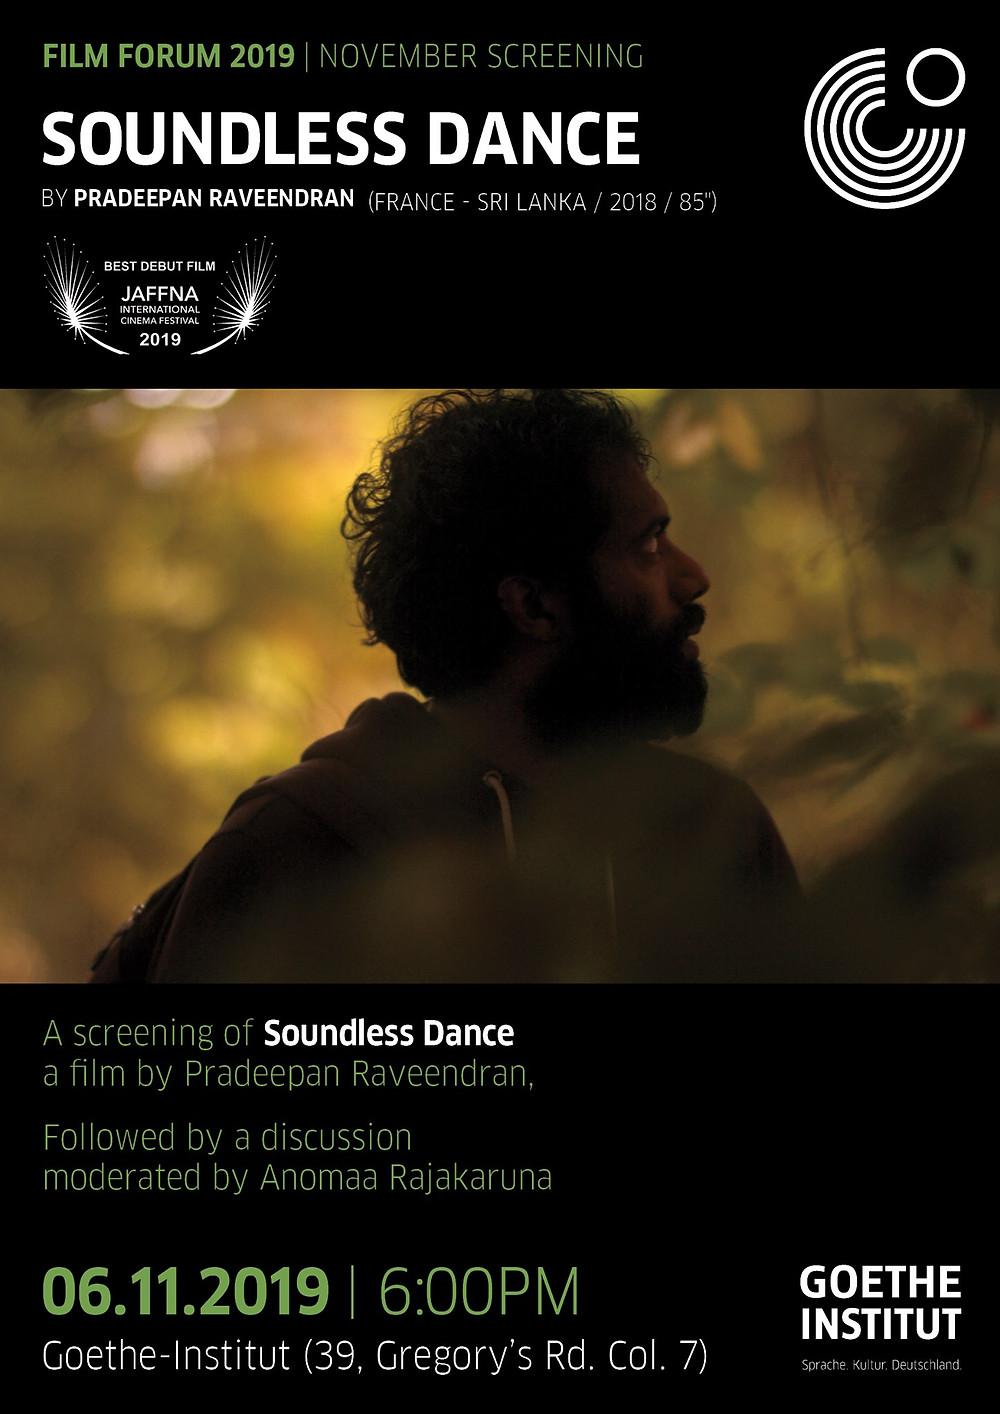 Soundless Dance, a film by Pradeepan Raveendran - Goethe Institut, Colombo, Sri Lanka.jpg